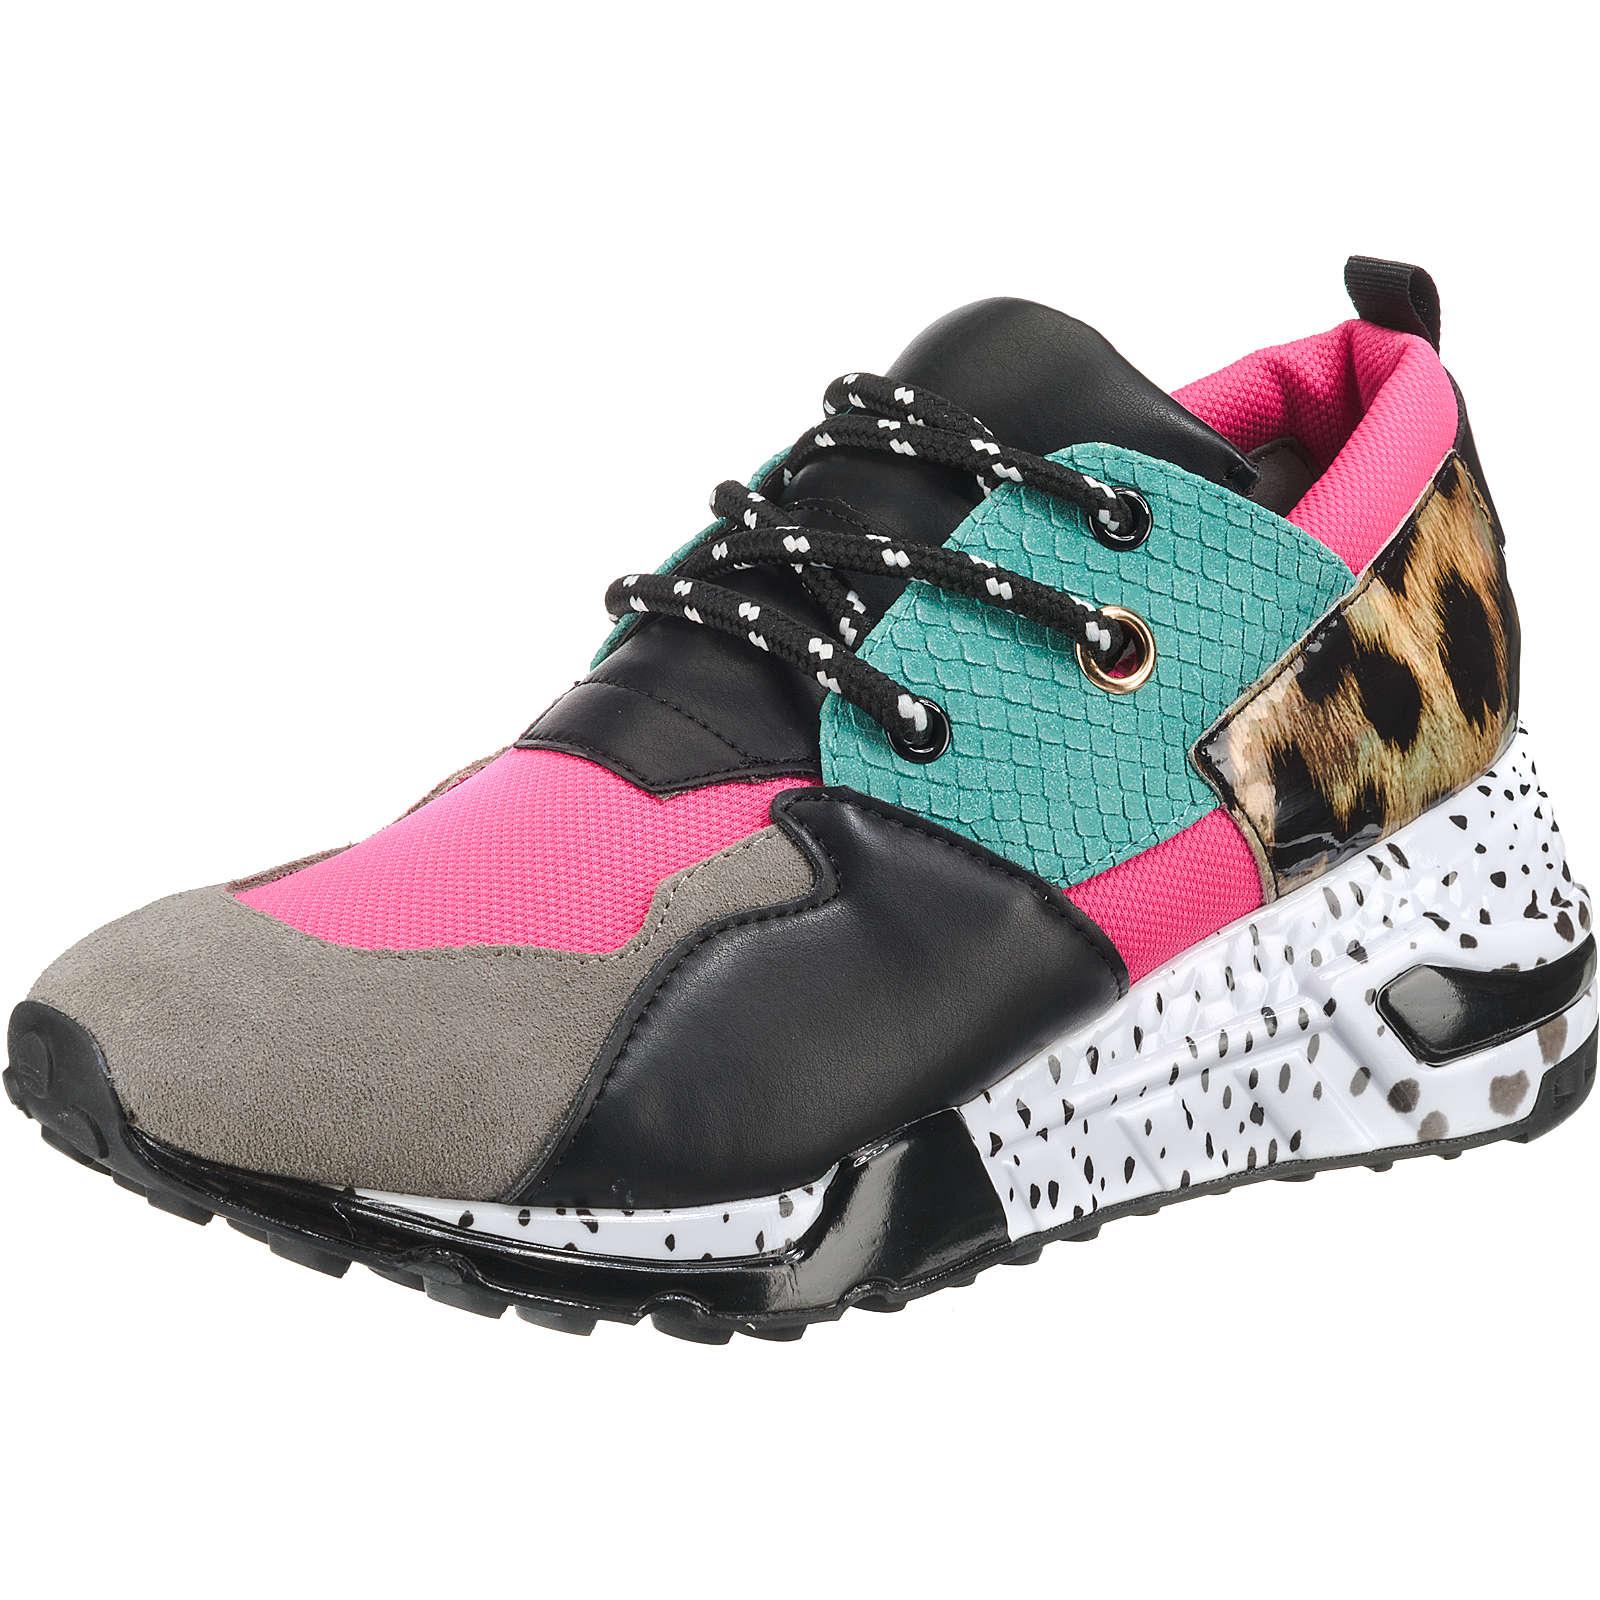 STEVE MADDEN CLIFF Sneakers Low pink Damen Gr. 37